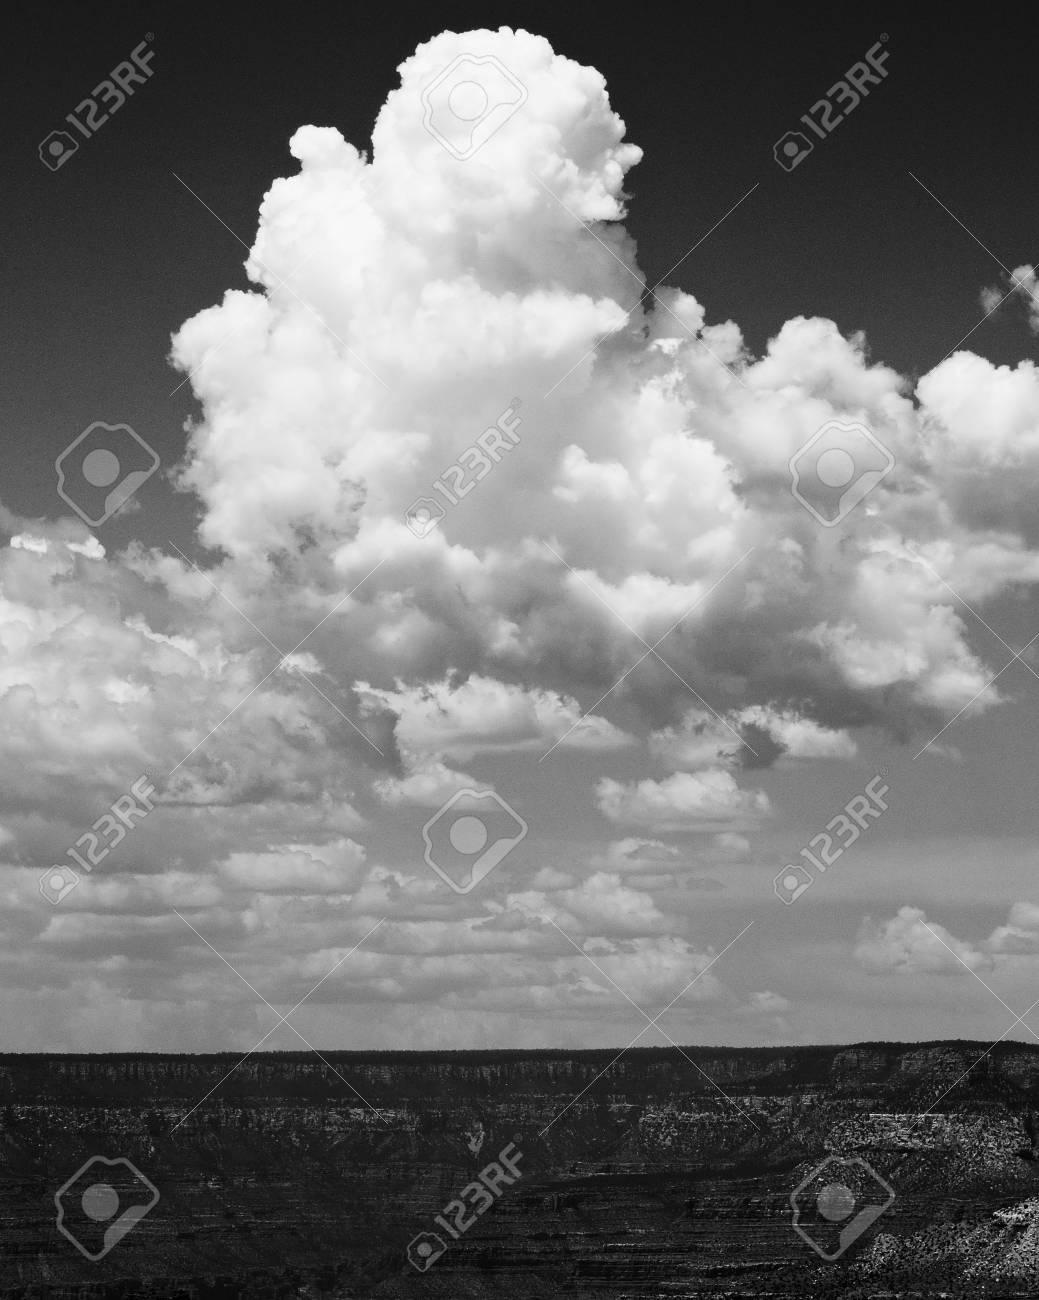 Towering Cumulus Clouds Stock Photo - 54780761